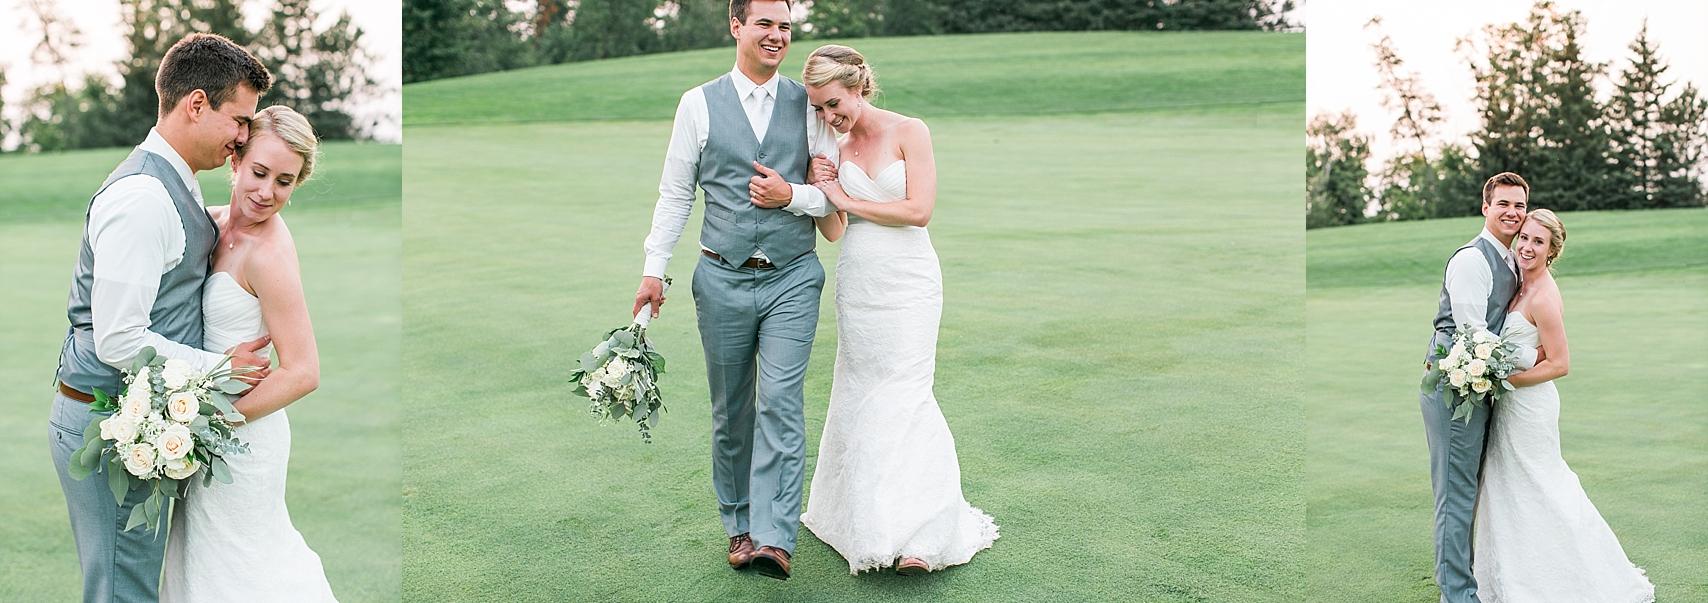 Minnesota Minneapolis Wedding Photographer Best Of 2018 Weddings Mallory Kiesow Photography_0050.jpg